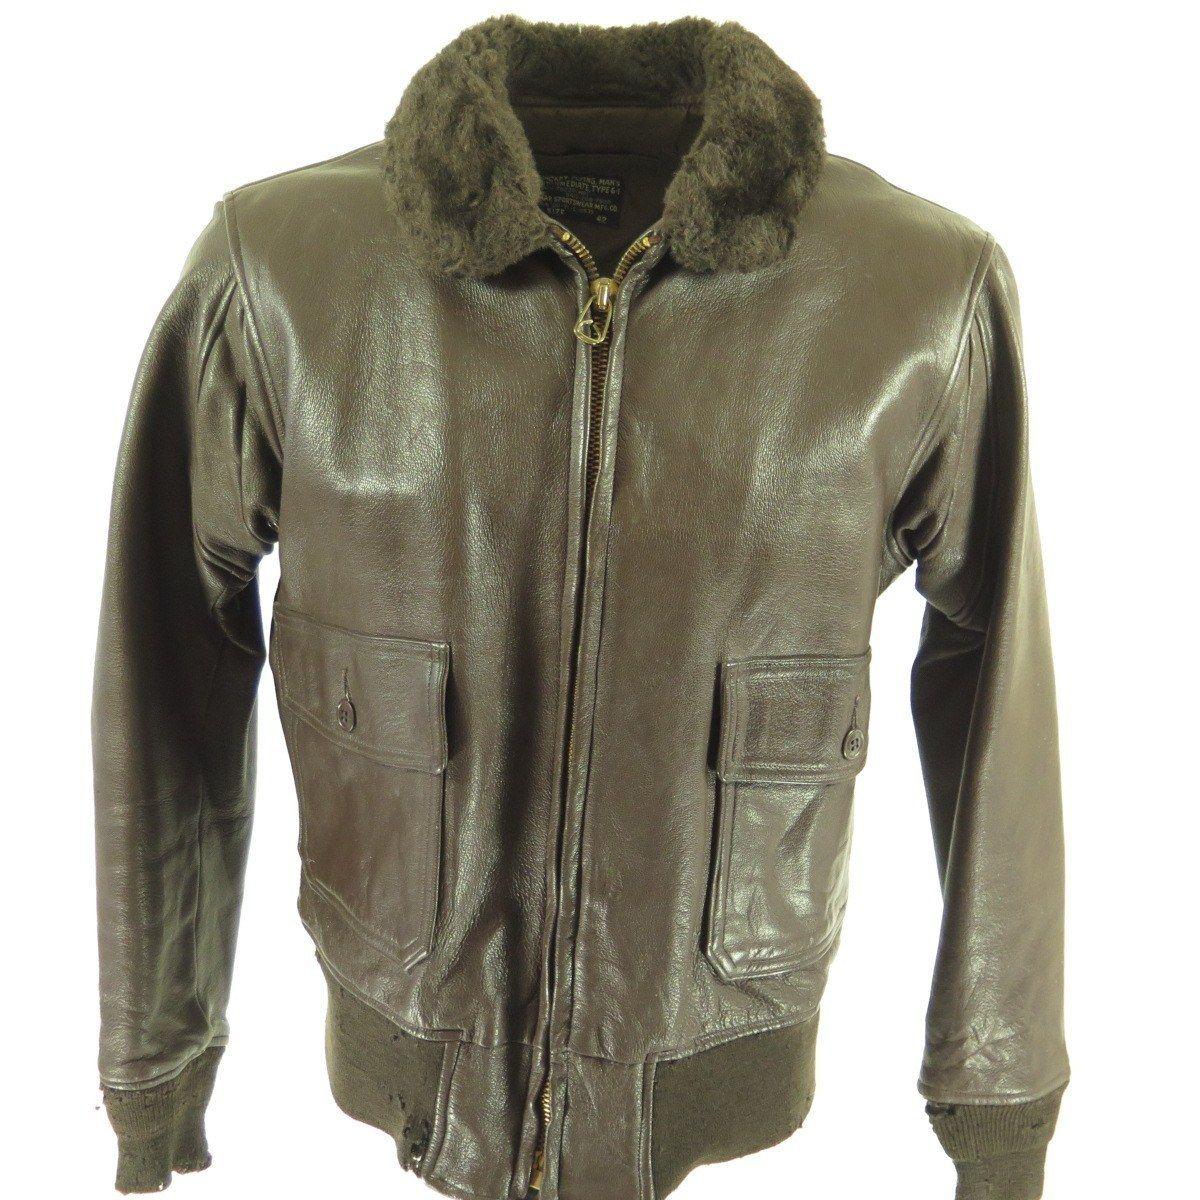 Vintage 70s G1 Leather Bomber Jacket 42 Or Large Goatskin Navy Mouton Collar The Clothing Vault Jackets Leather Bomber Jacket Bomber Jacket Mens [ 1200 x 1200 Pixel ]